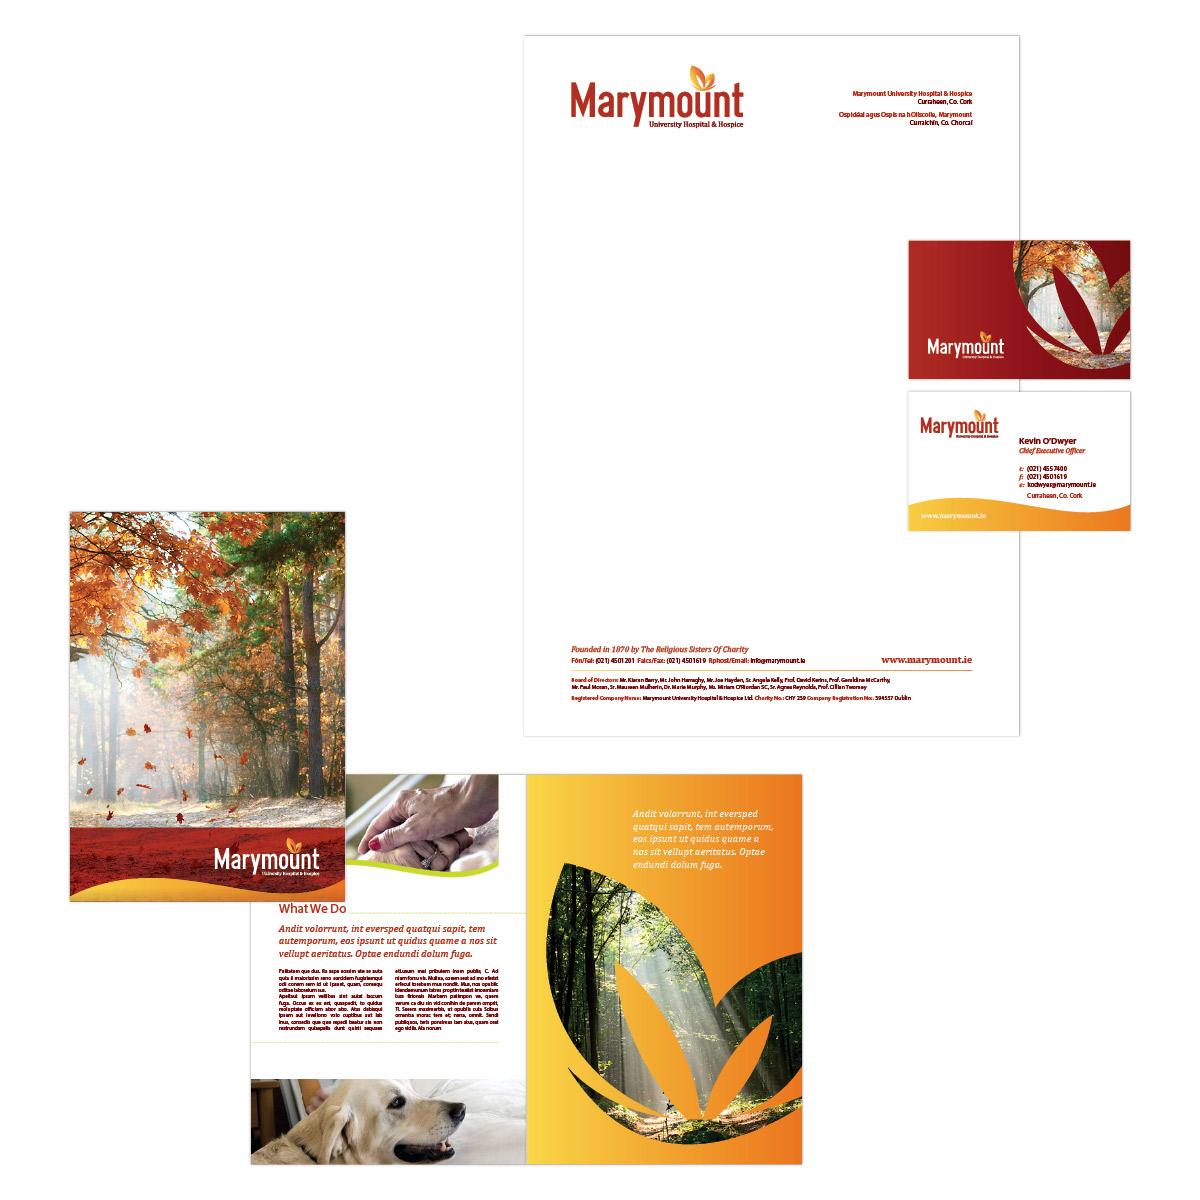 Marymount_Brand_02.jpg